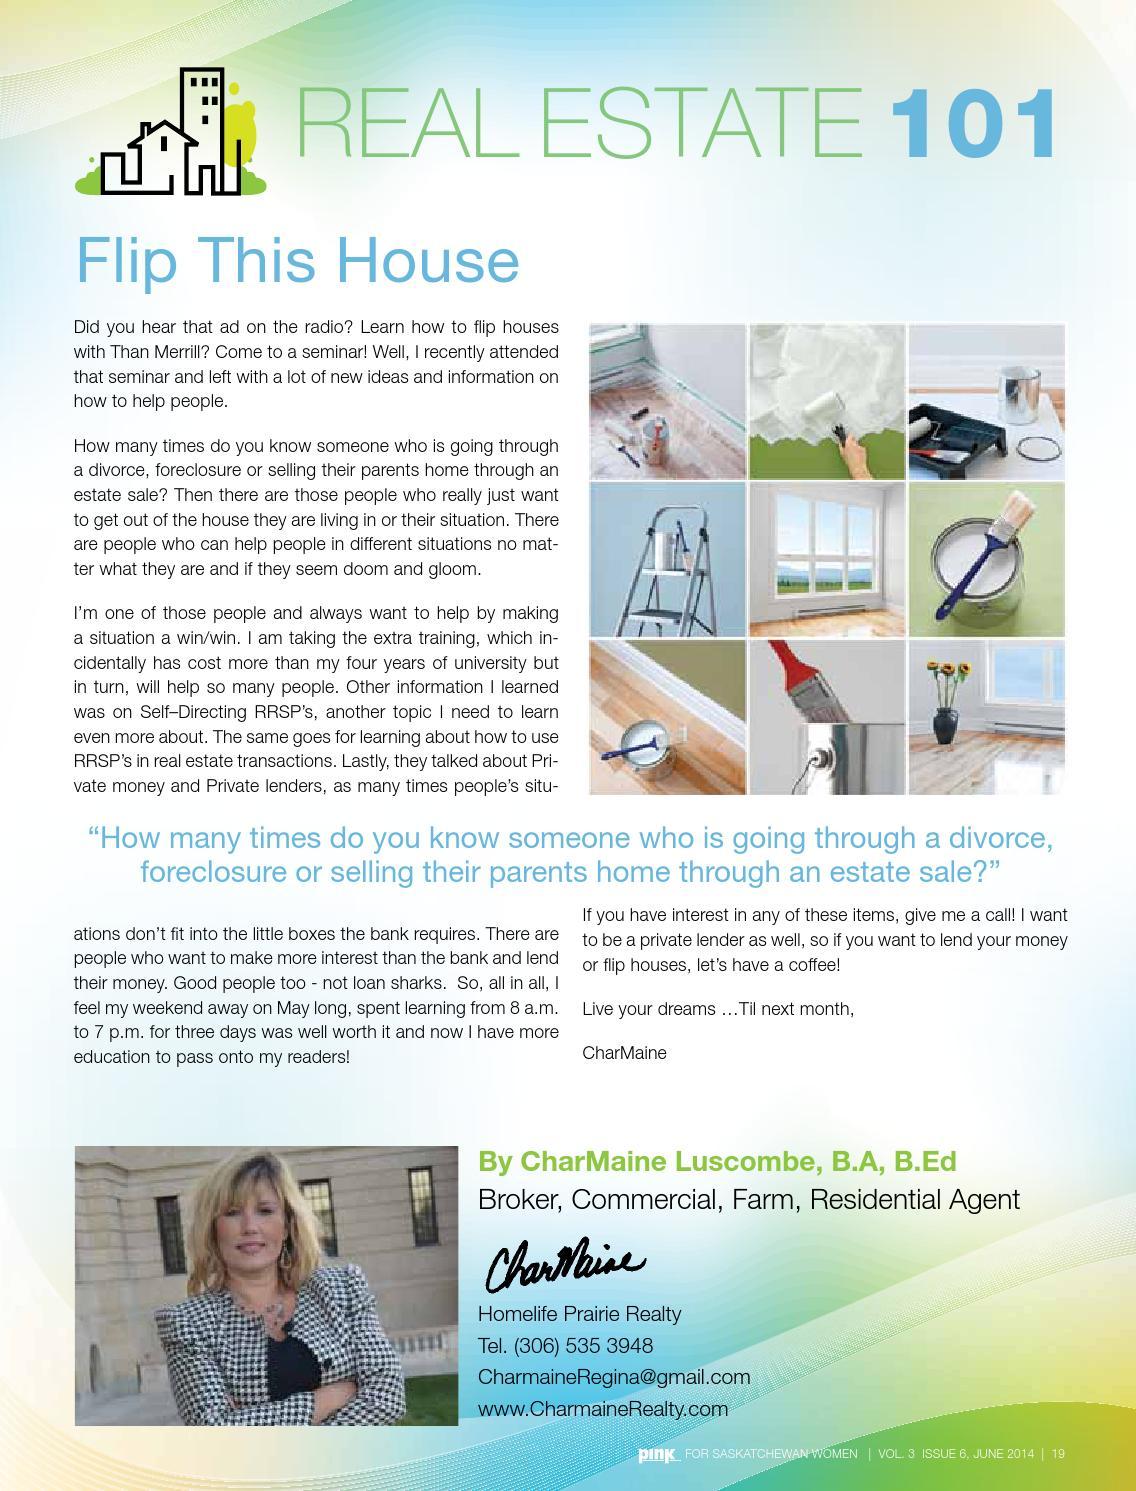 Flip your house seminar fabulous flip this house seminar for Flip this house host